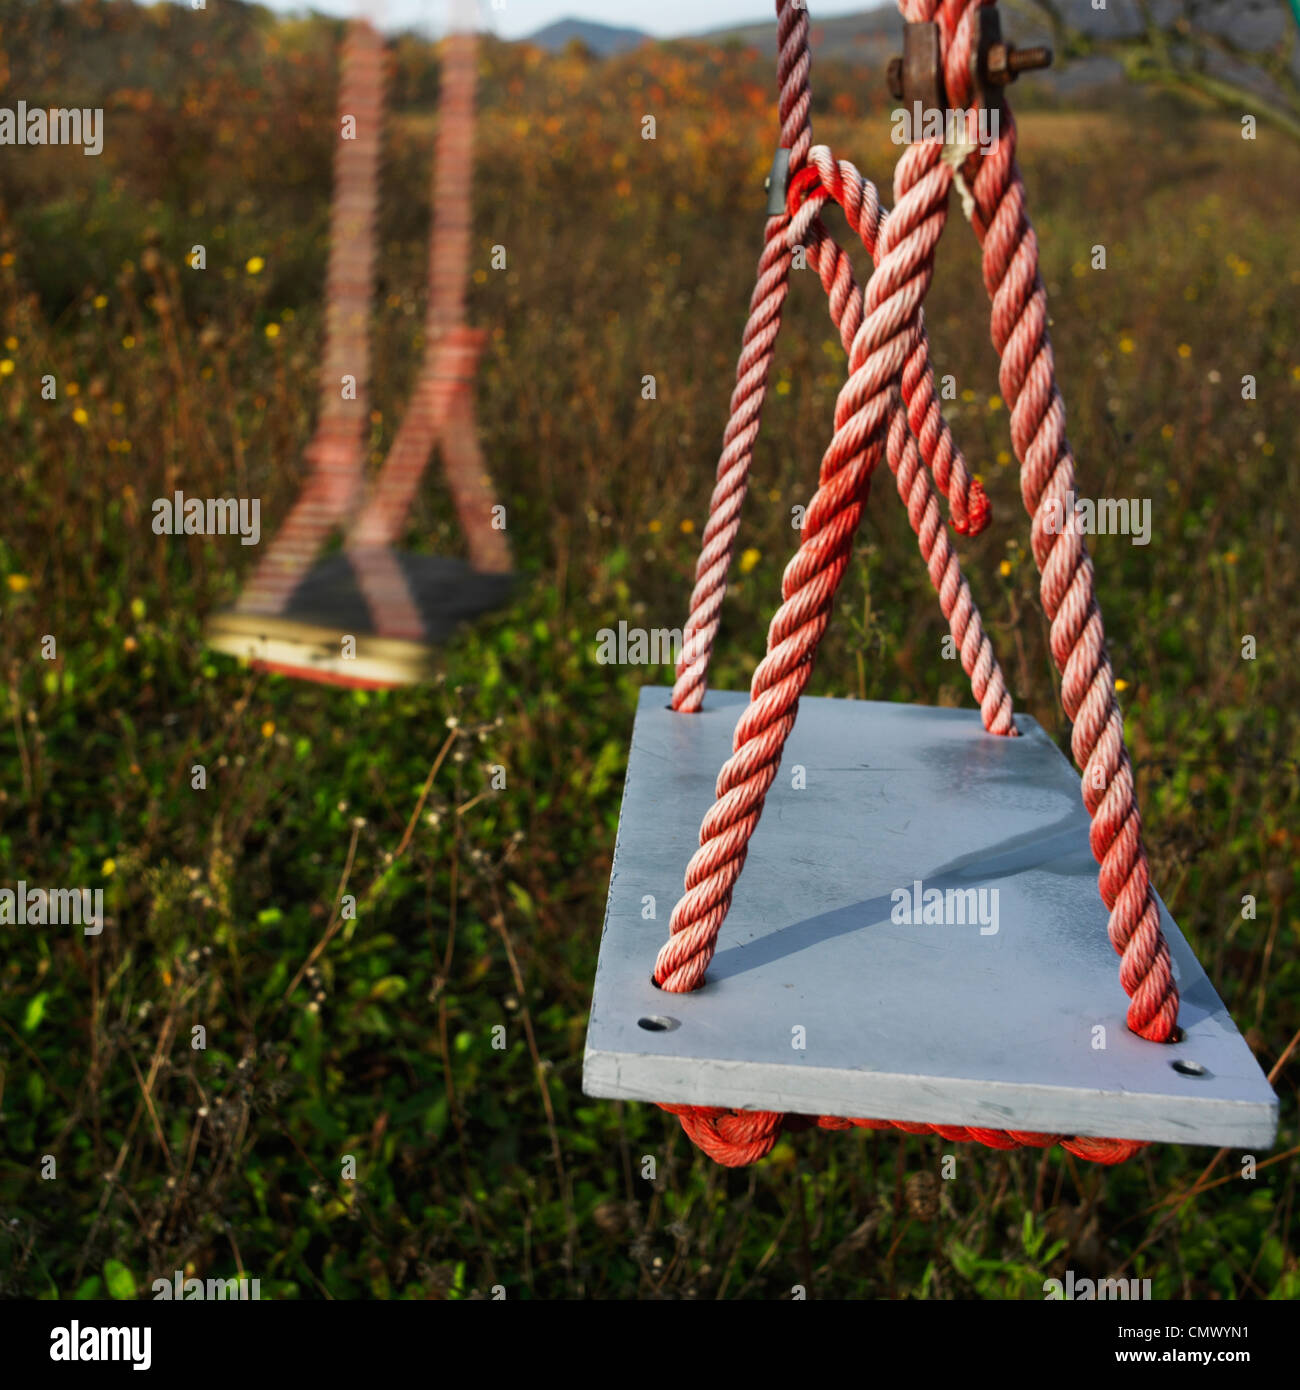 Two swings - Stock Image